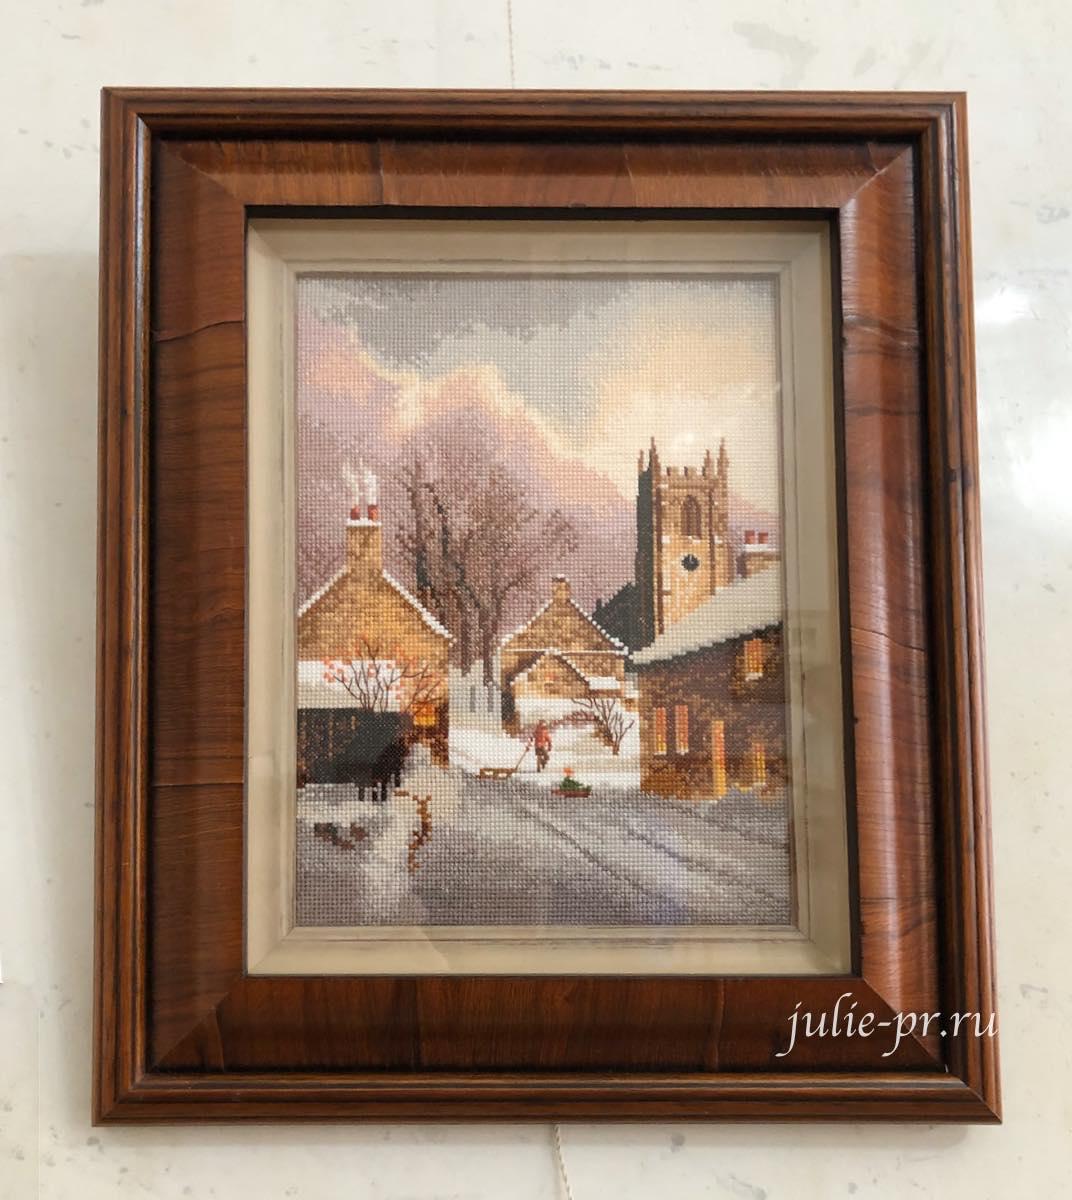 Snowy village, Заснеженная деревня, вышивка крестом, Heritage, John Clayton, выставка Грани Джона Клейтона